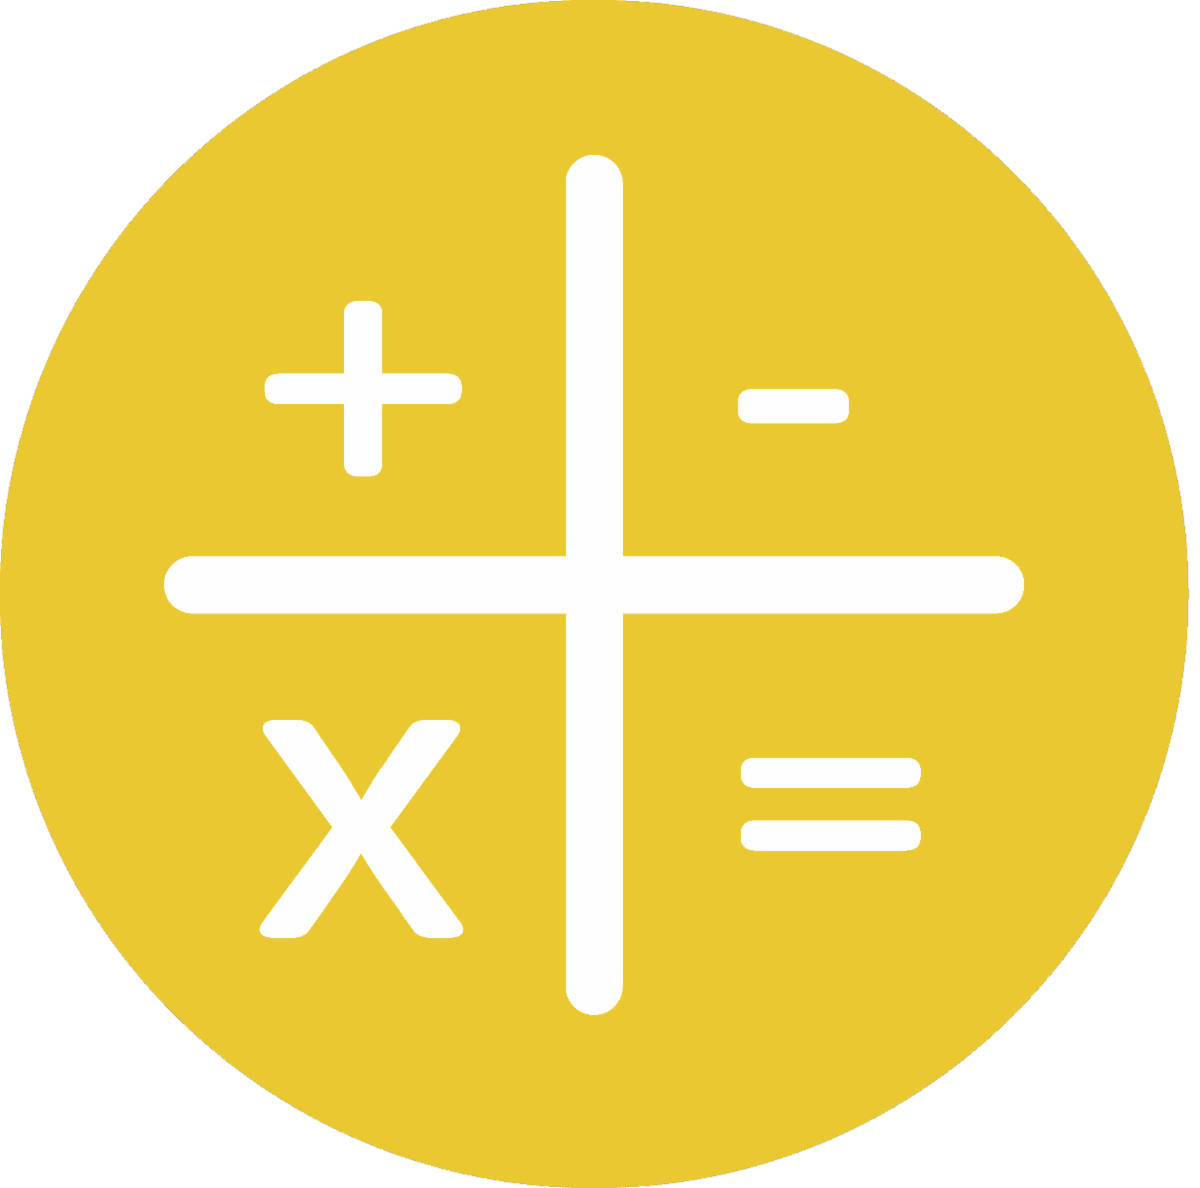 Mathematical & Scientific Concepts